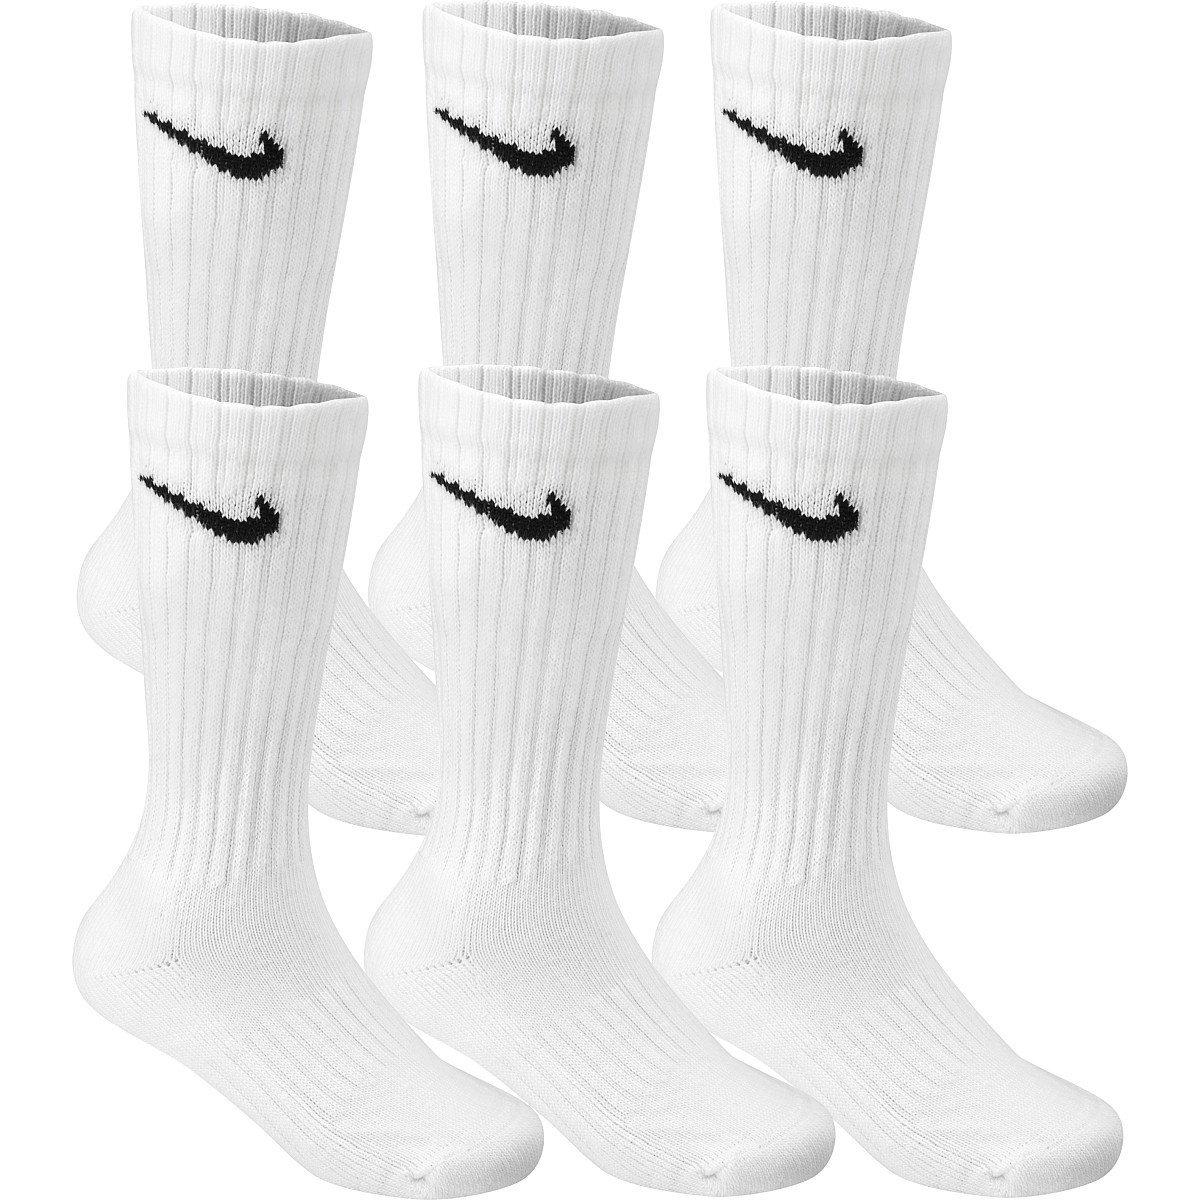 7b7cf91d0202d Amazon.com  Nike Premium Cotton Crew Cut Socks (6 Pack) Large Black  Sports    Outdoors